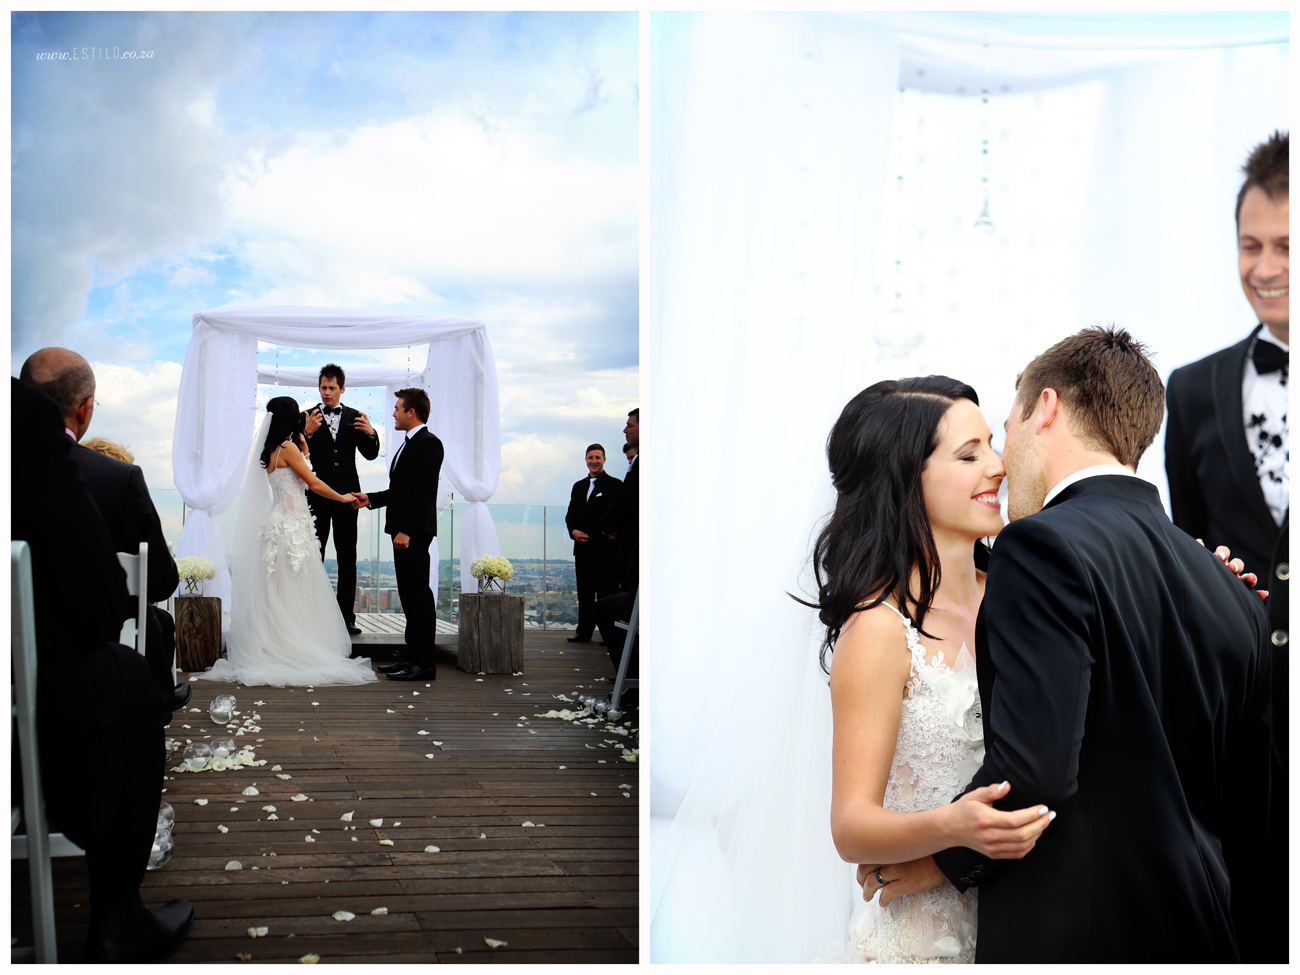 johannesburg-wedding-photographers-wedding-at-randlords-best-wedding-photographers-south-africa_0030.jpg